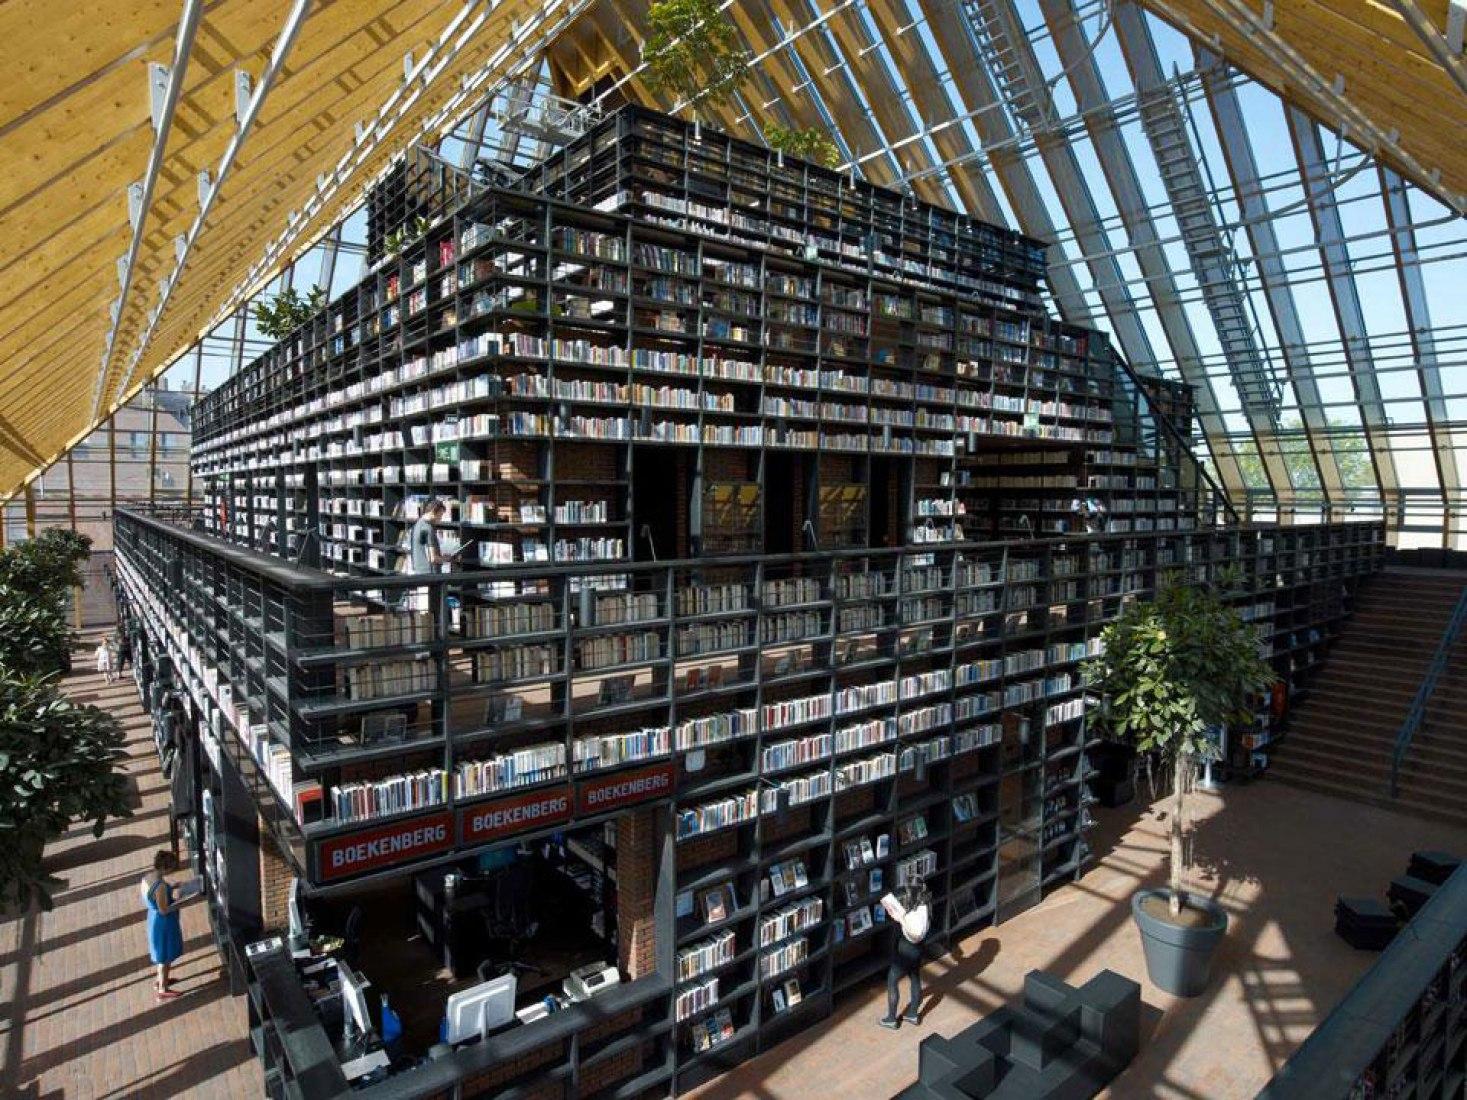 Library Interior view. Photography by Jeroen Musch and Jonas Klok (MVRDV). Courtesy of MVRDV.